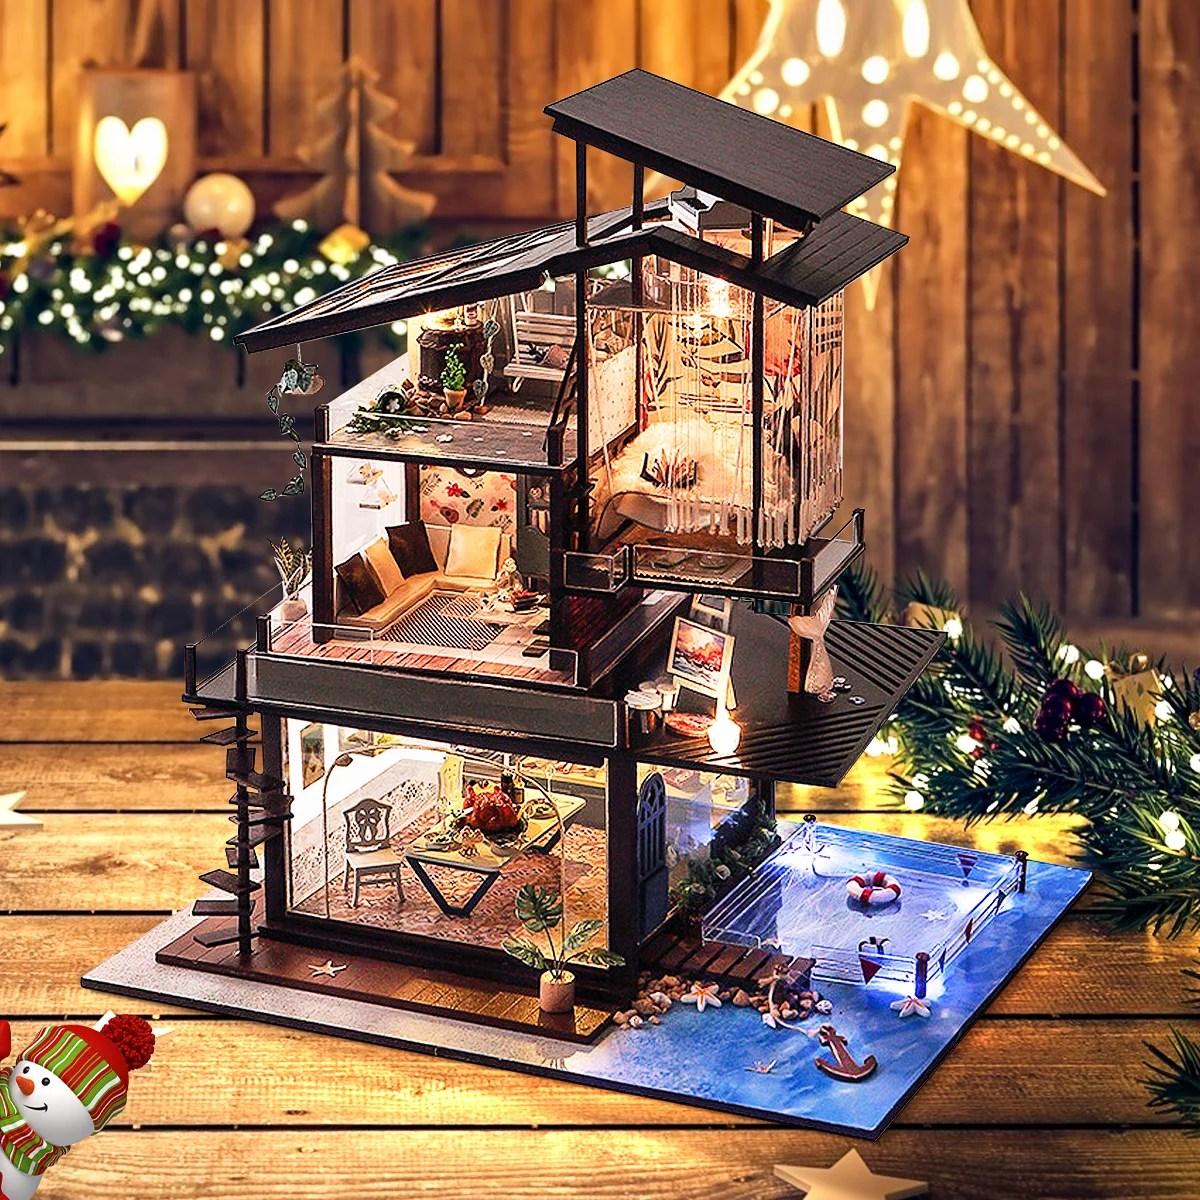 led light miniature coastal villa dollhouse diy kit wooden doll house model toy with furniture home ornament decor kids adult gift multi pattern